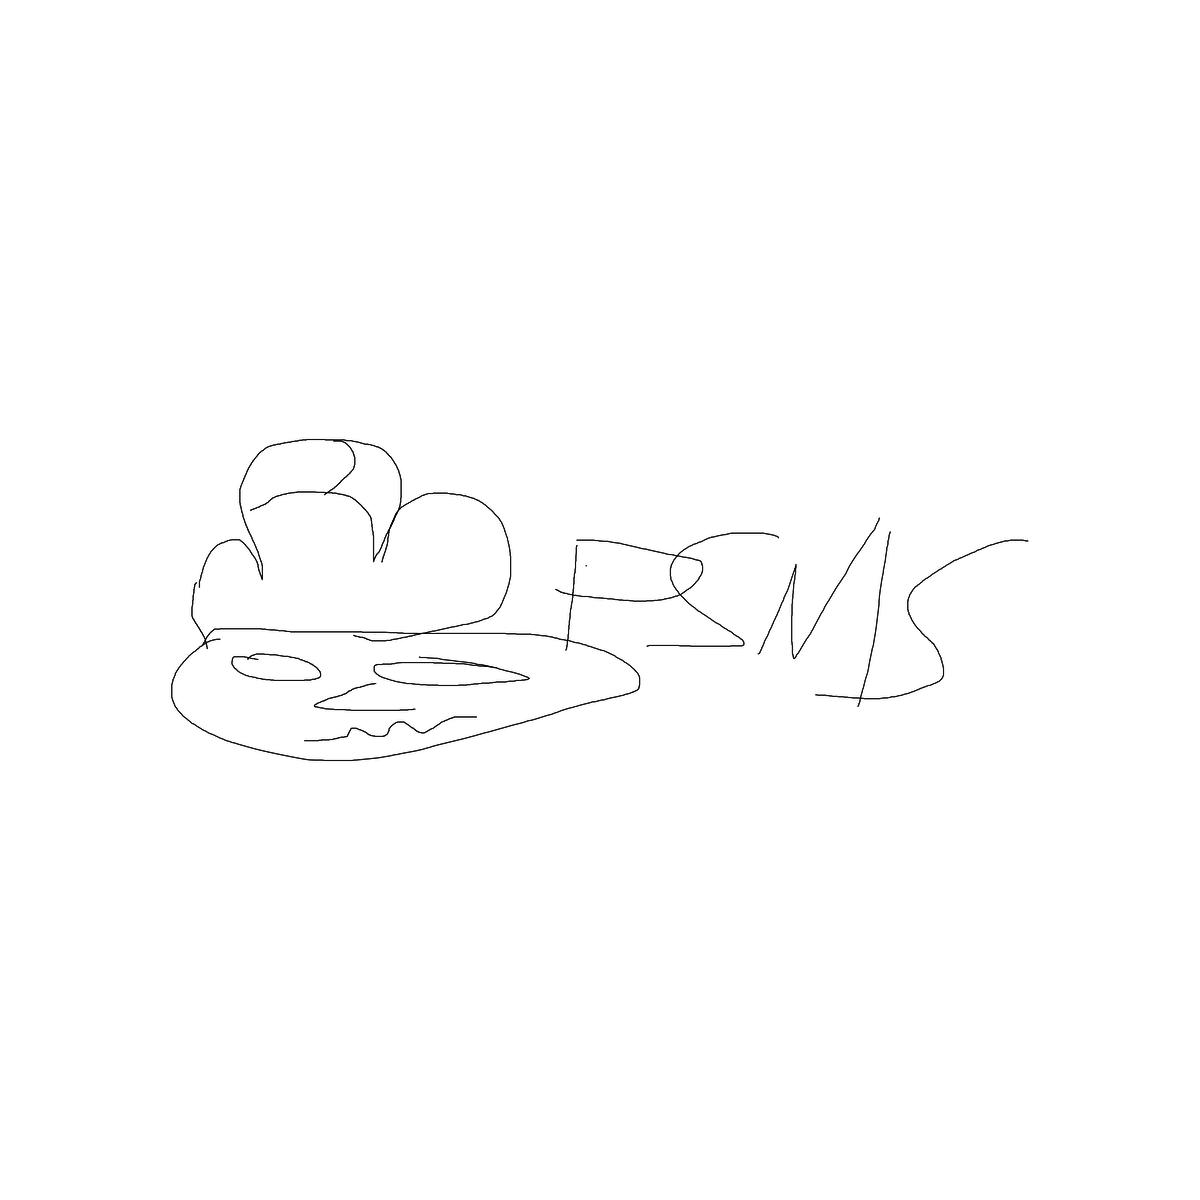 BAAAM drawing#9624 lat:48.2093238830566400lng: 16.3717288970947270